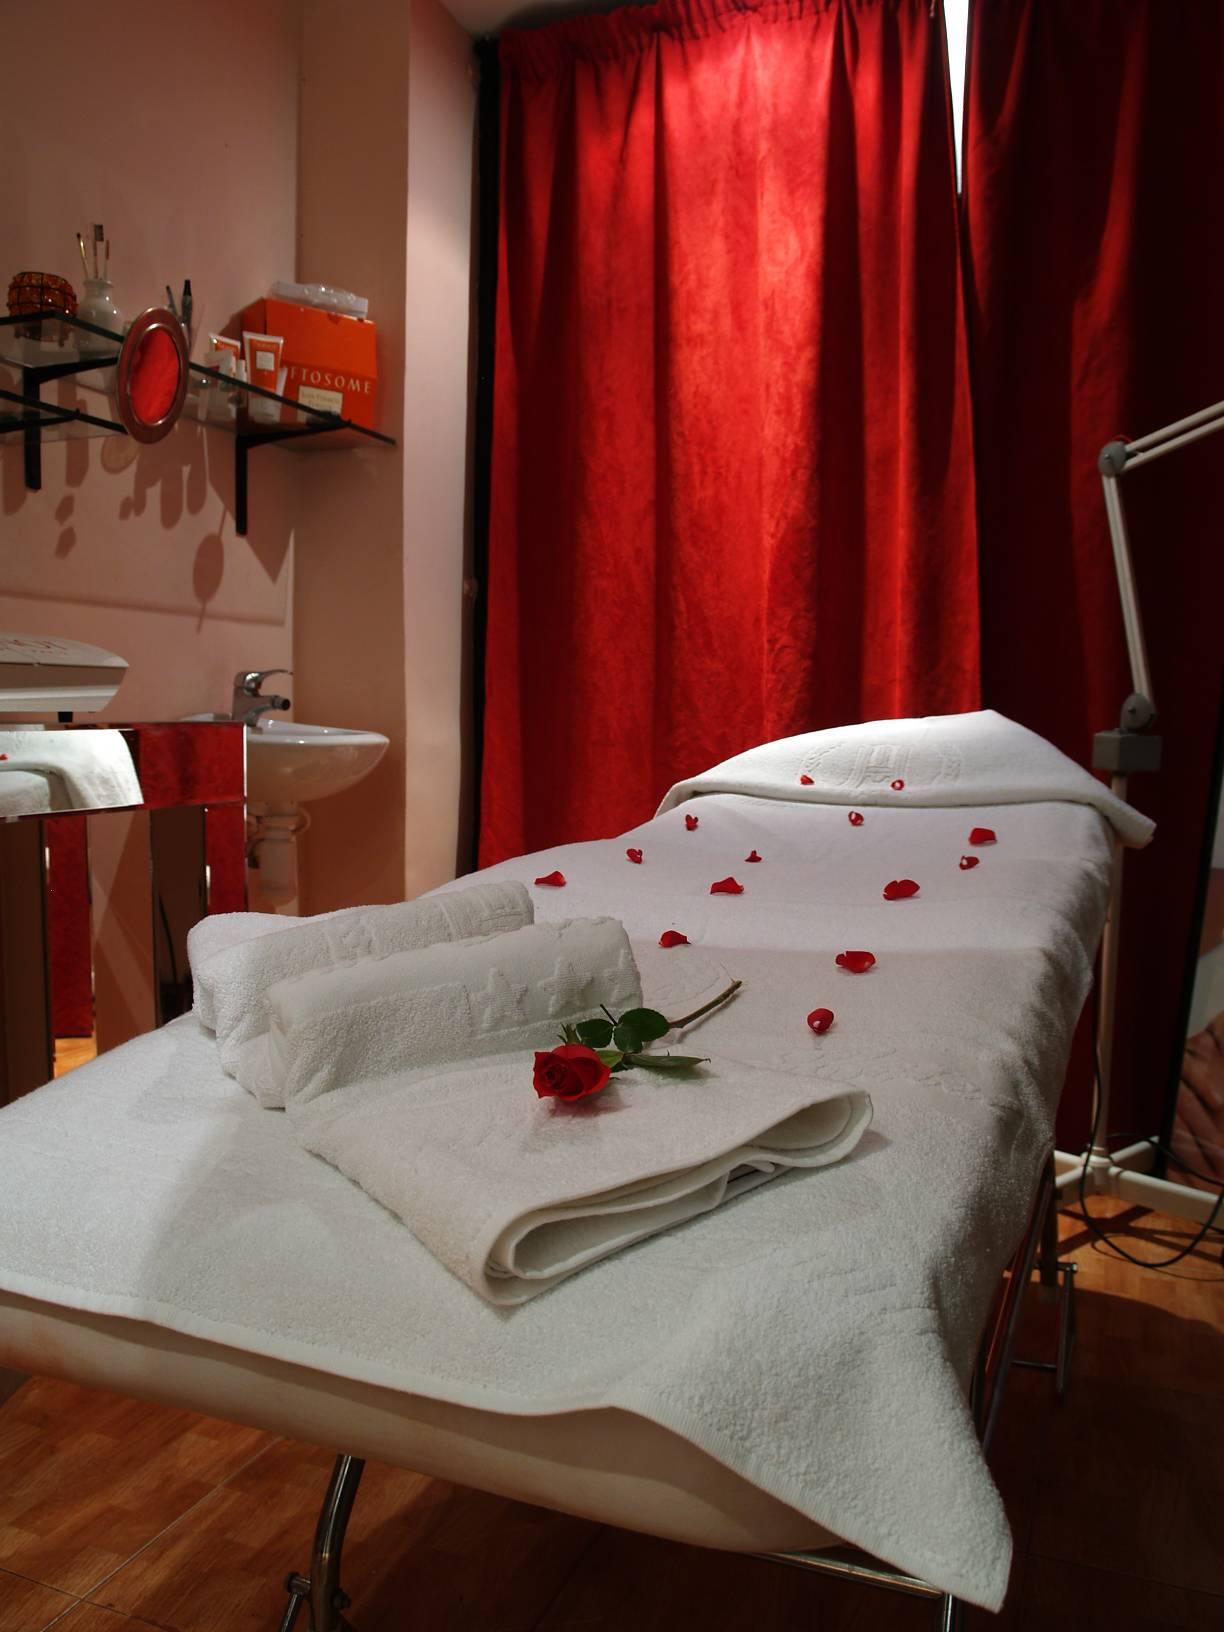 Facq Salle De Bain Zaventem ~ Offre Deals Hotels Hotel Imperial Holiday Marrakech